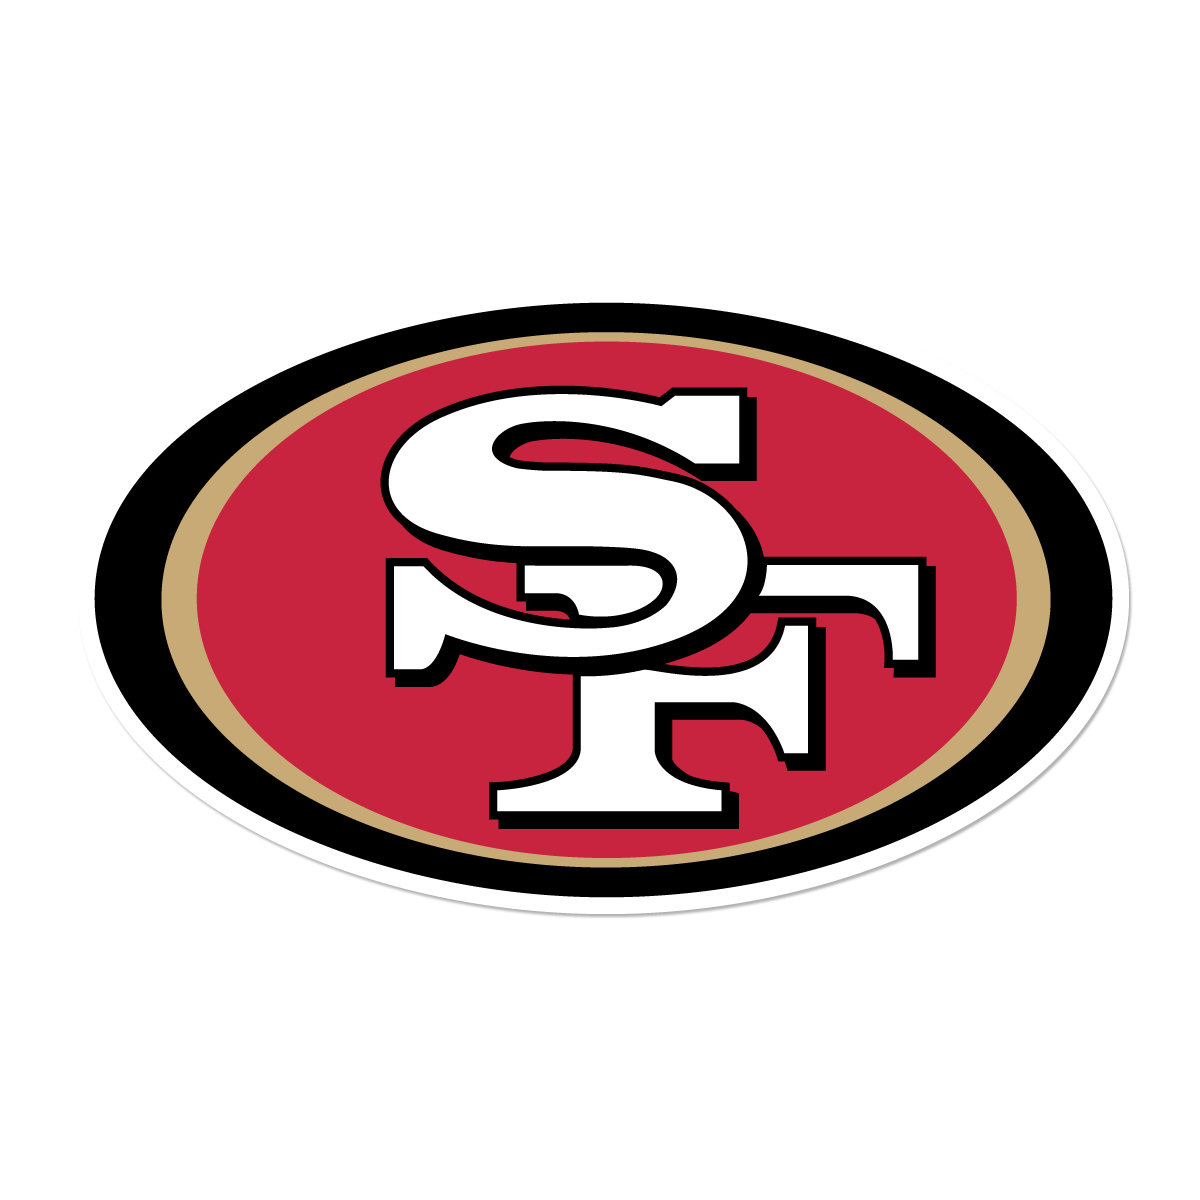 San Francisco 49ers Wallpapers Sports Hq San Francisco 49ers